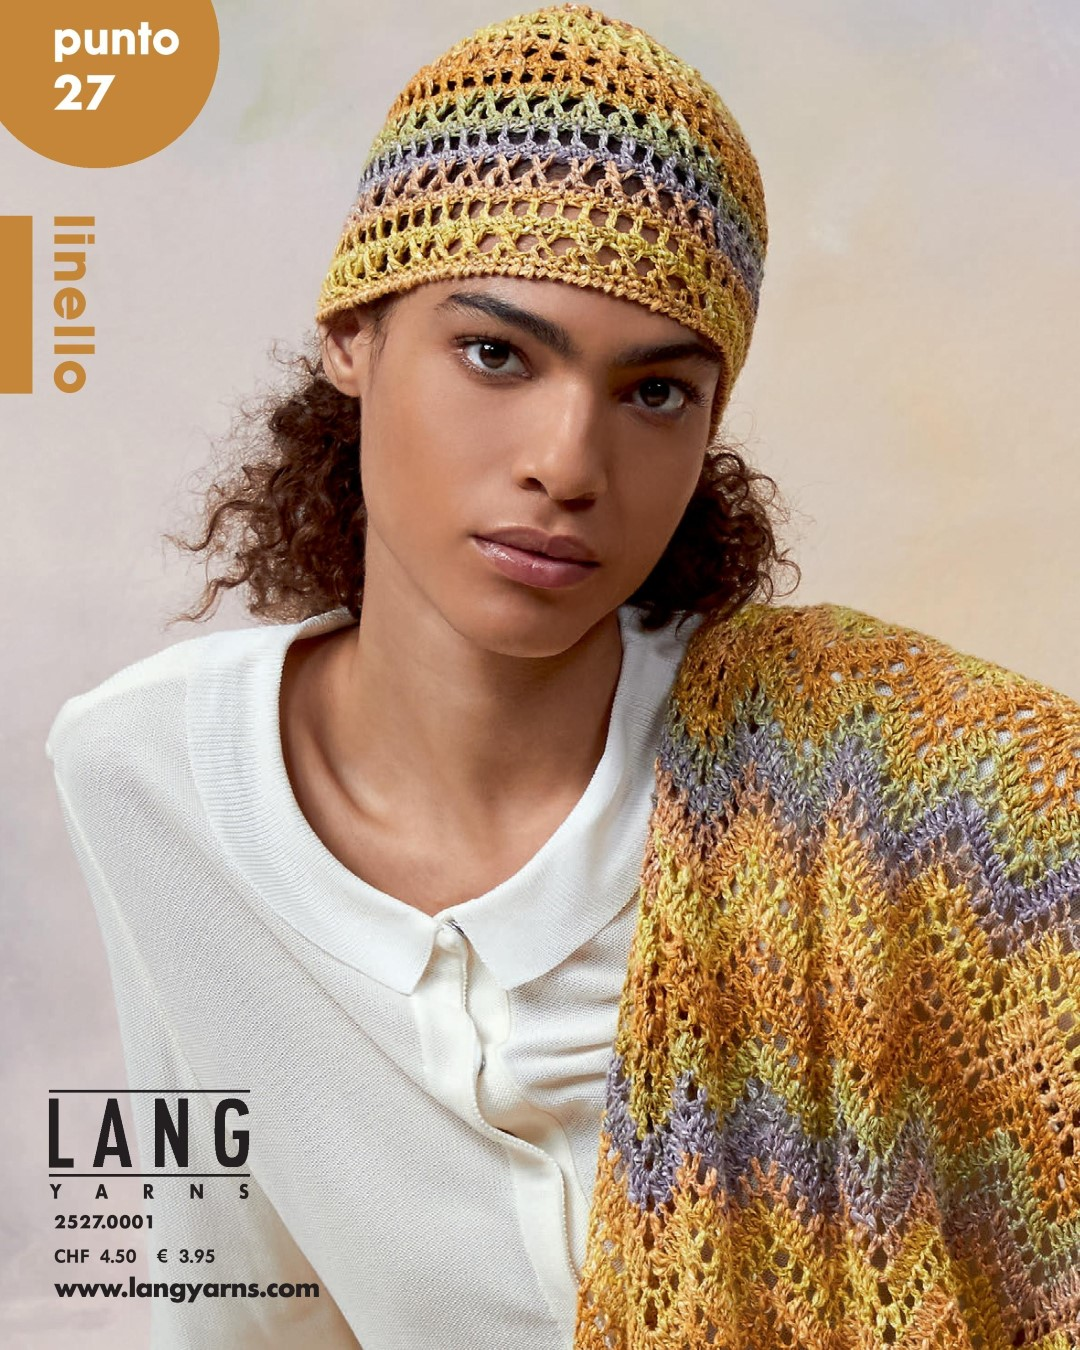 PUNTO 27 LINELLO LANG YARNS (Large)